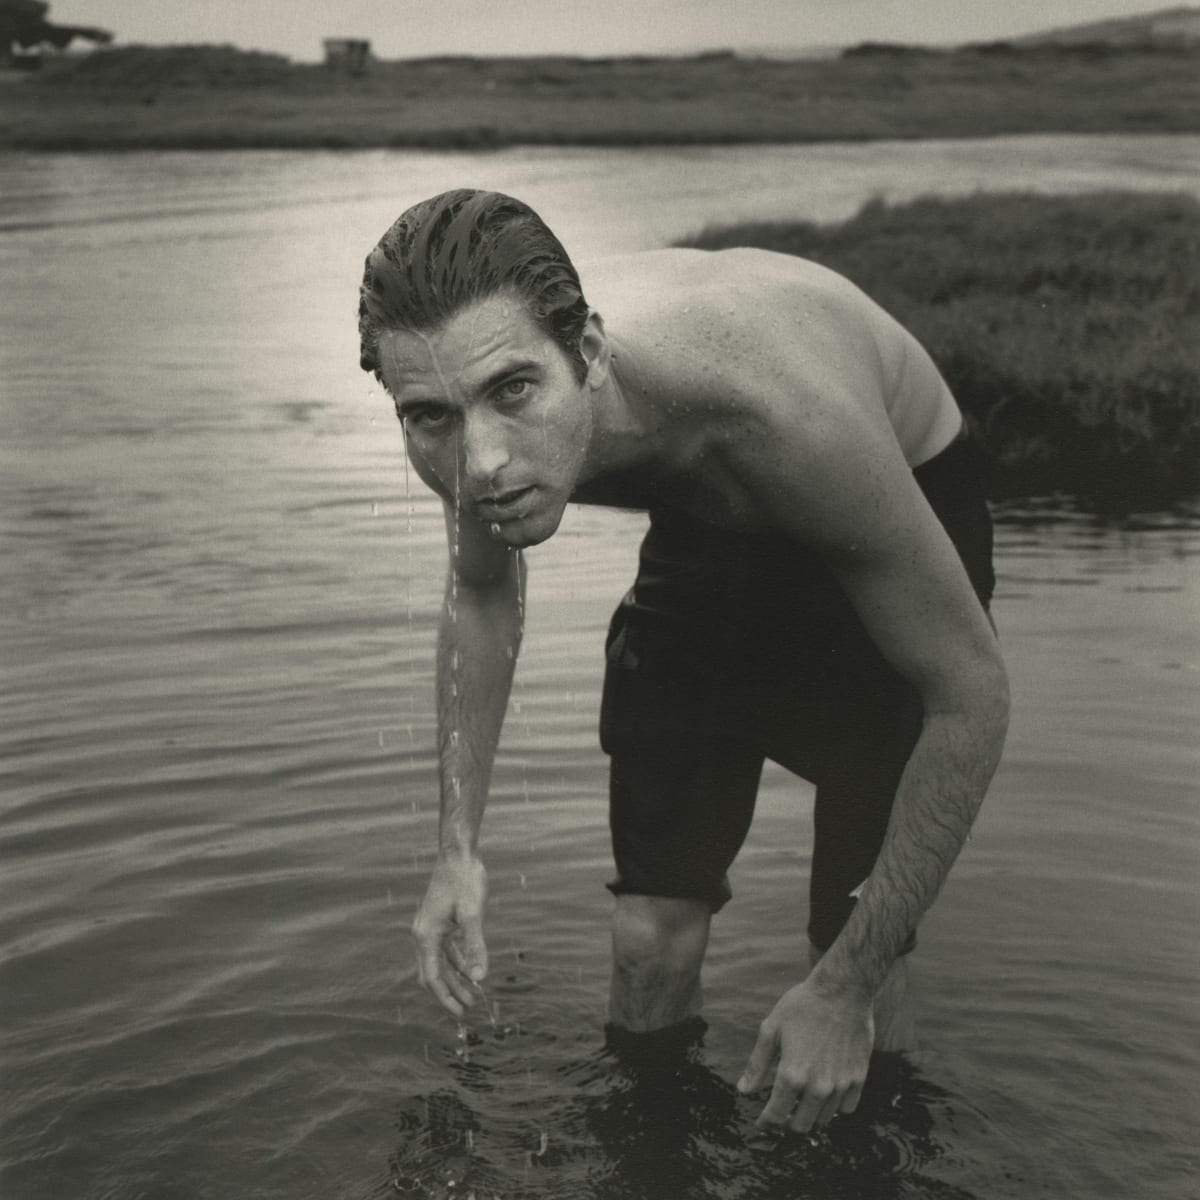 Arthur Tress, Surfer, Hilo, 1996